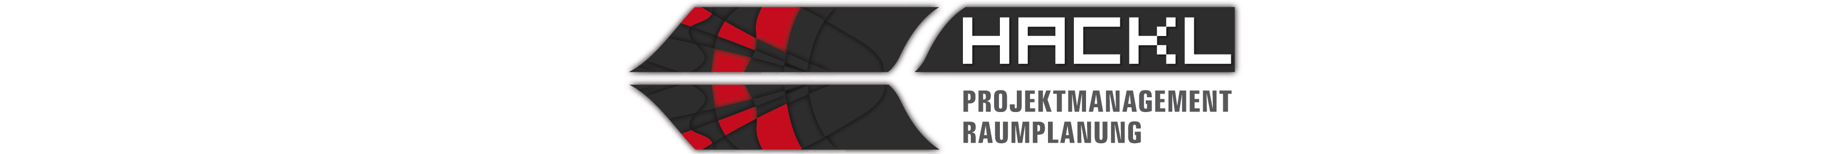 Ingenieurbüro für Raumplanung Hackl